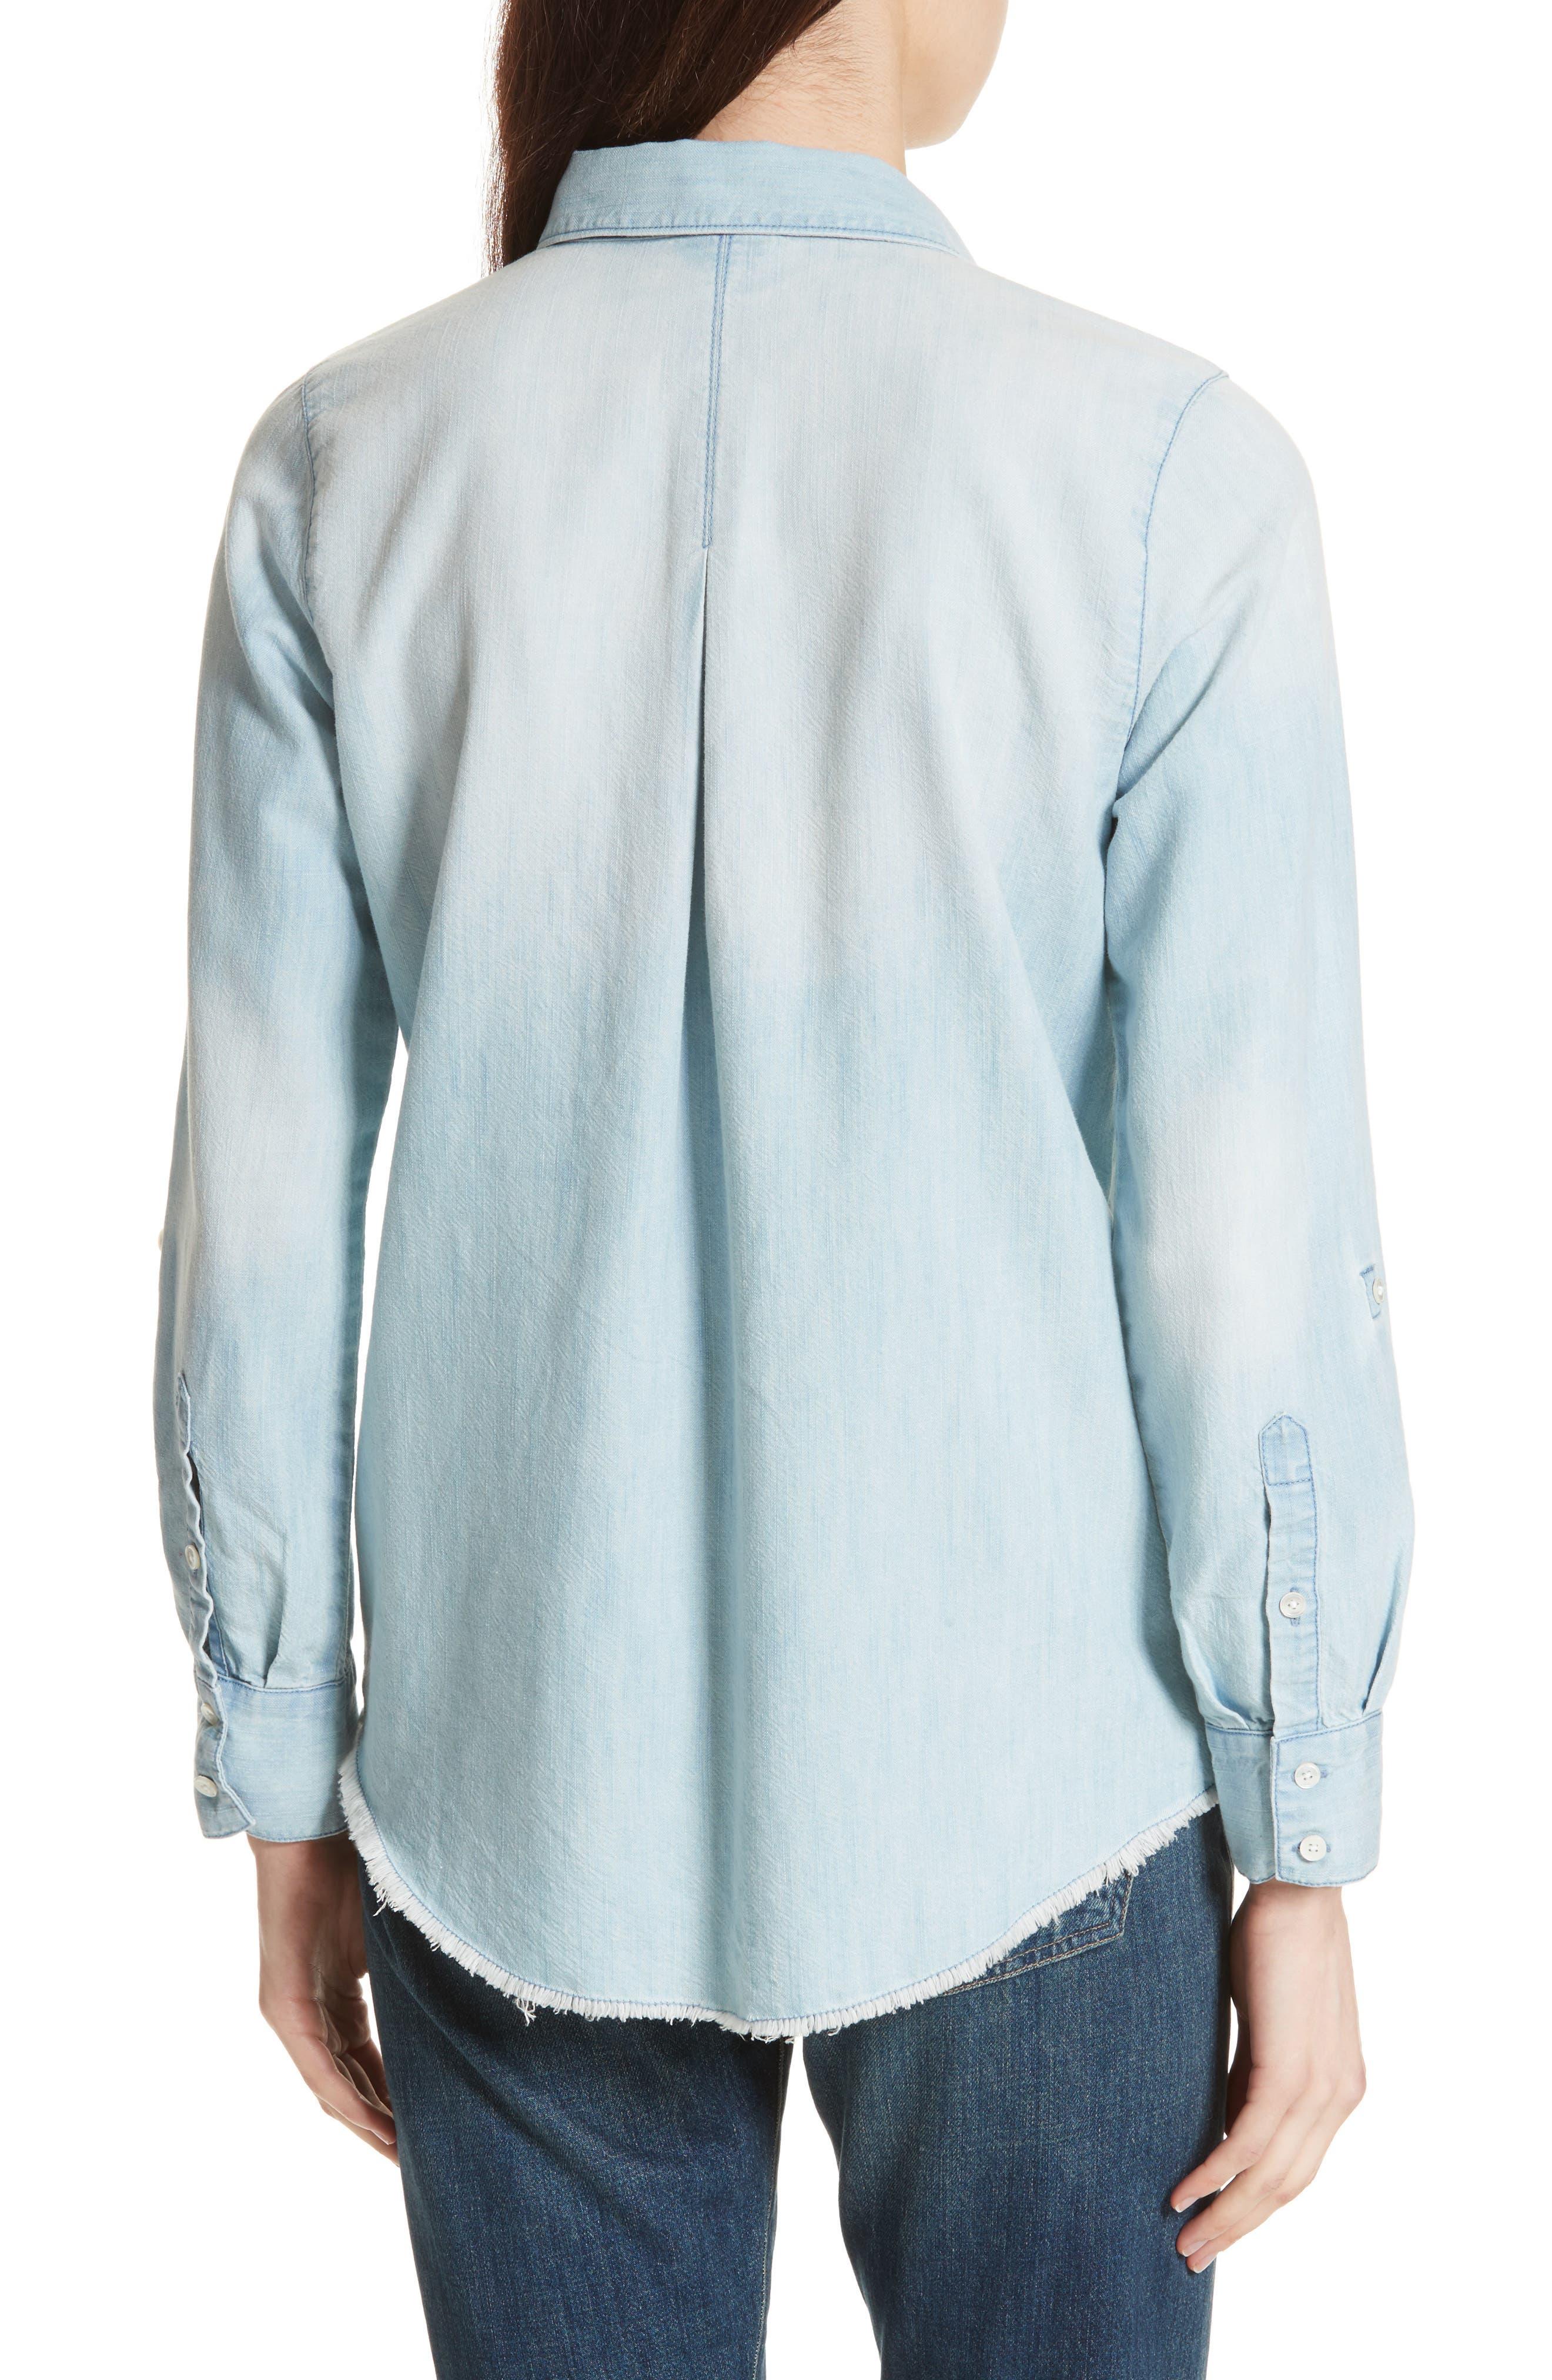 Onyx B Chambray Shirt,                             Alternate thumbnail 2, color,                             481